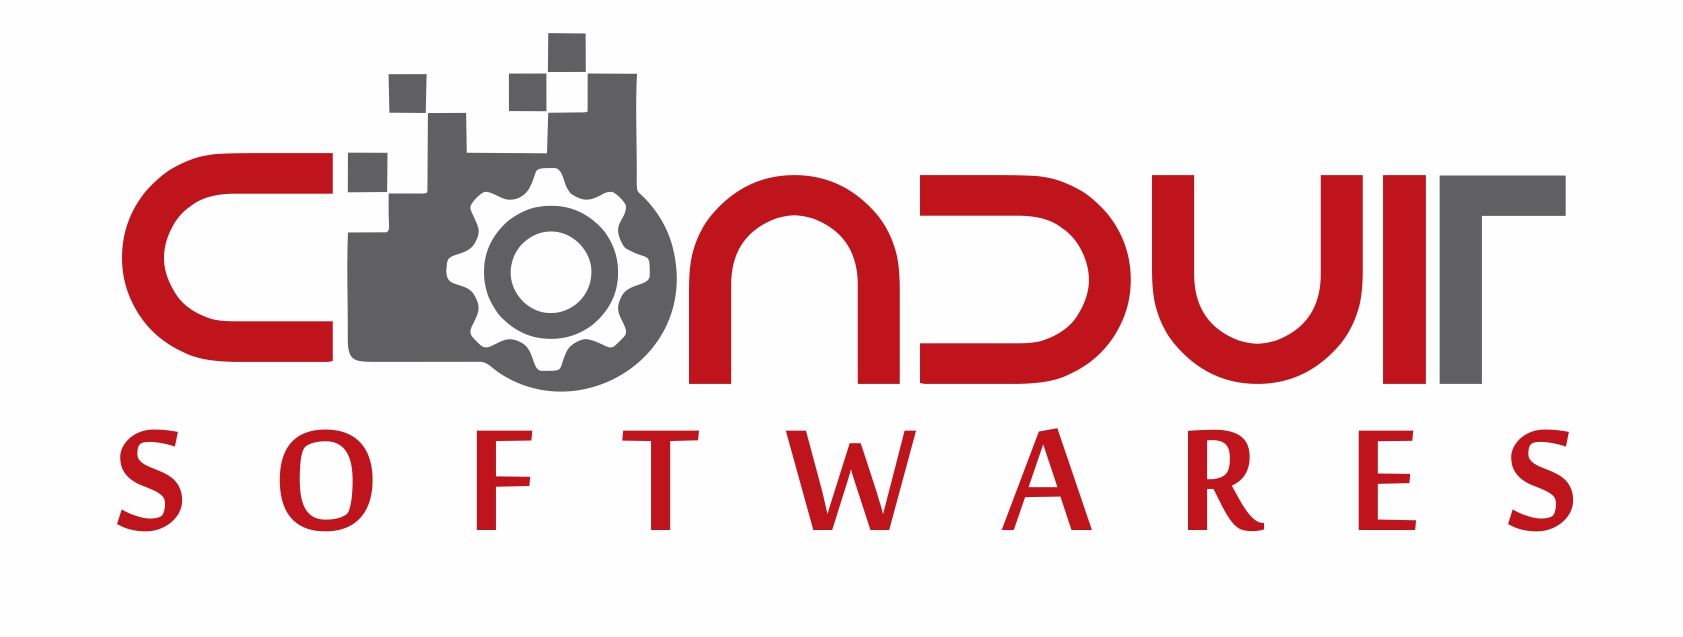 Conduit Softwares